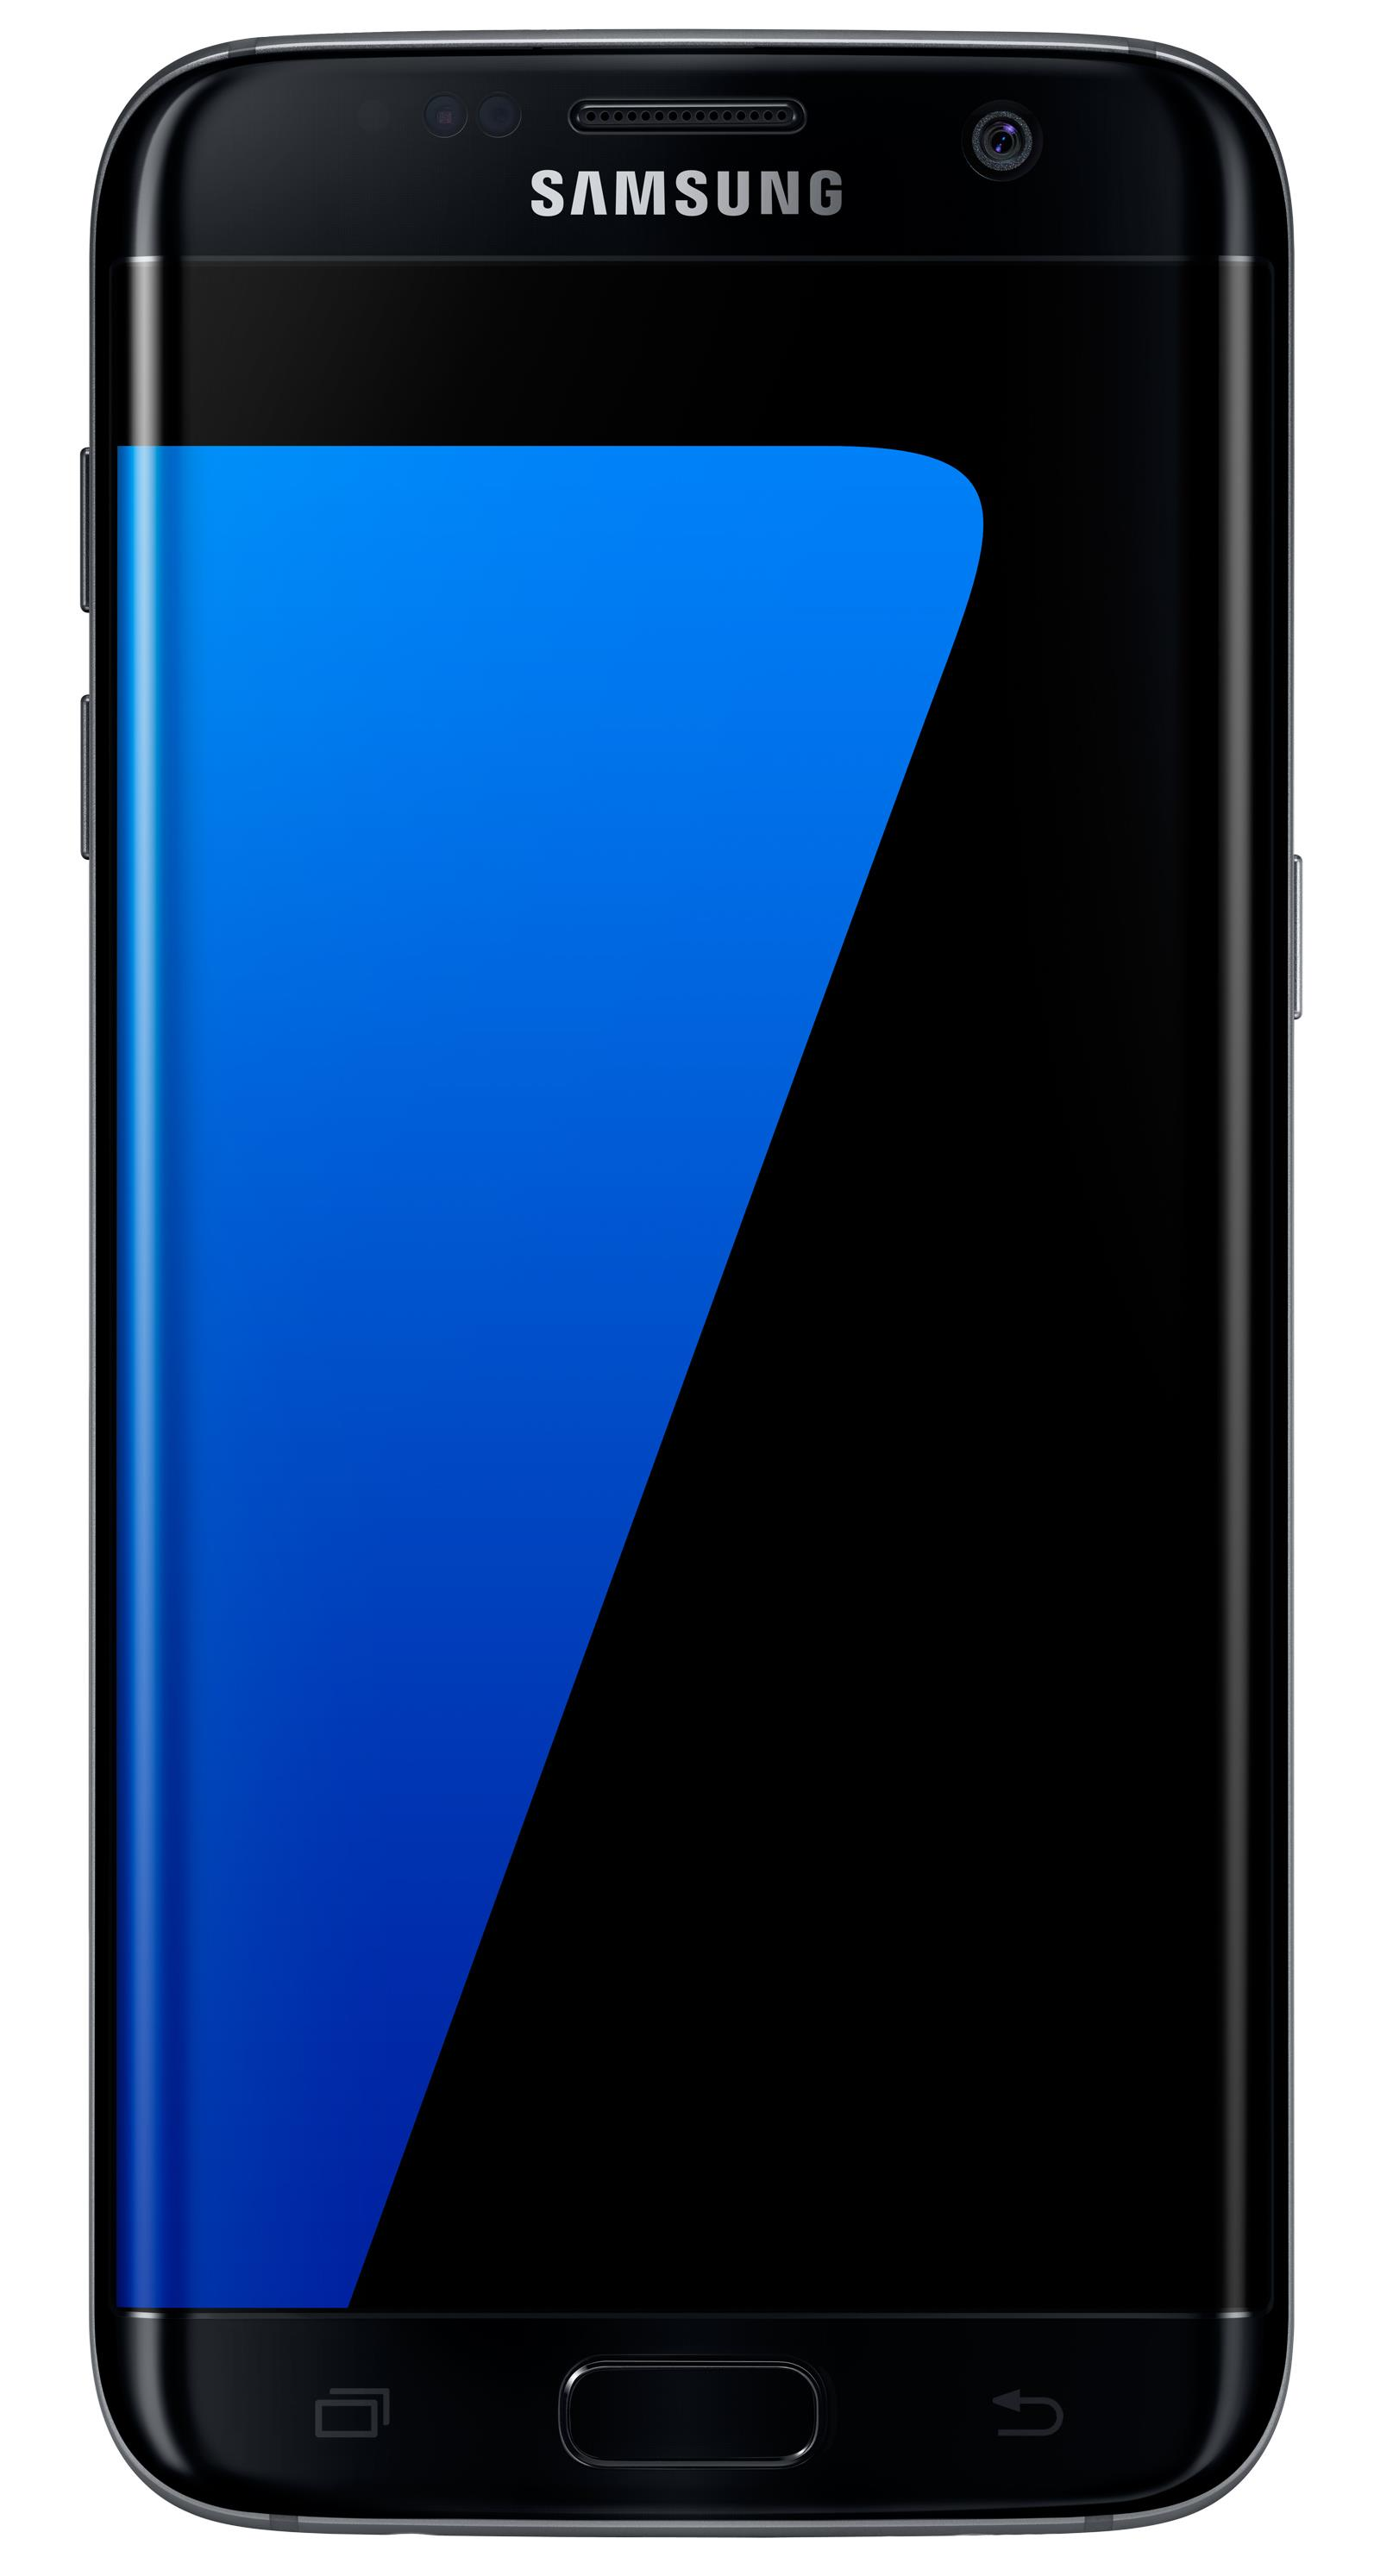 Samsung Galaxy S7 edge (5.5 inch) 32GB 12MP Smartphone (Black)